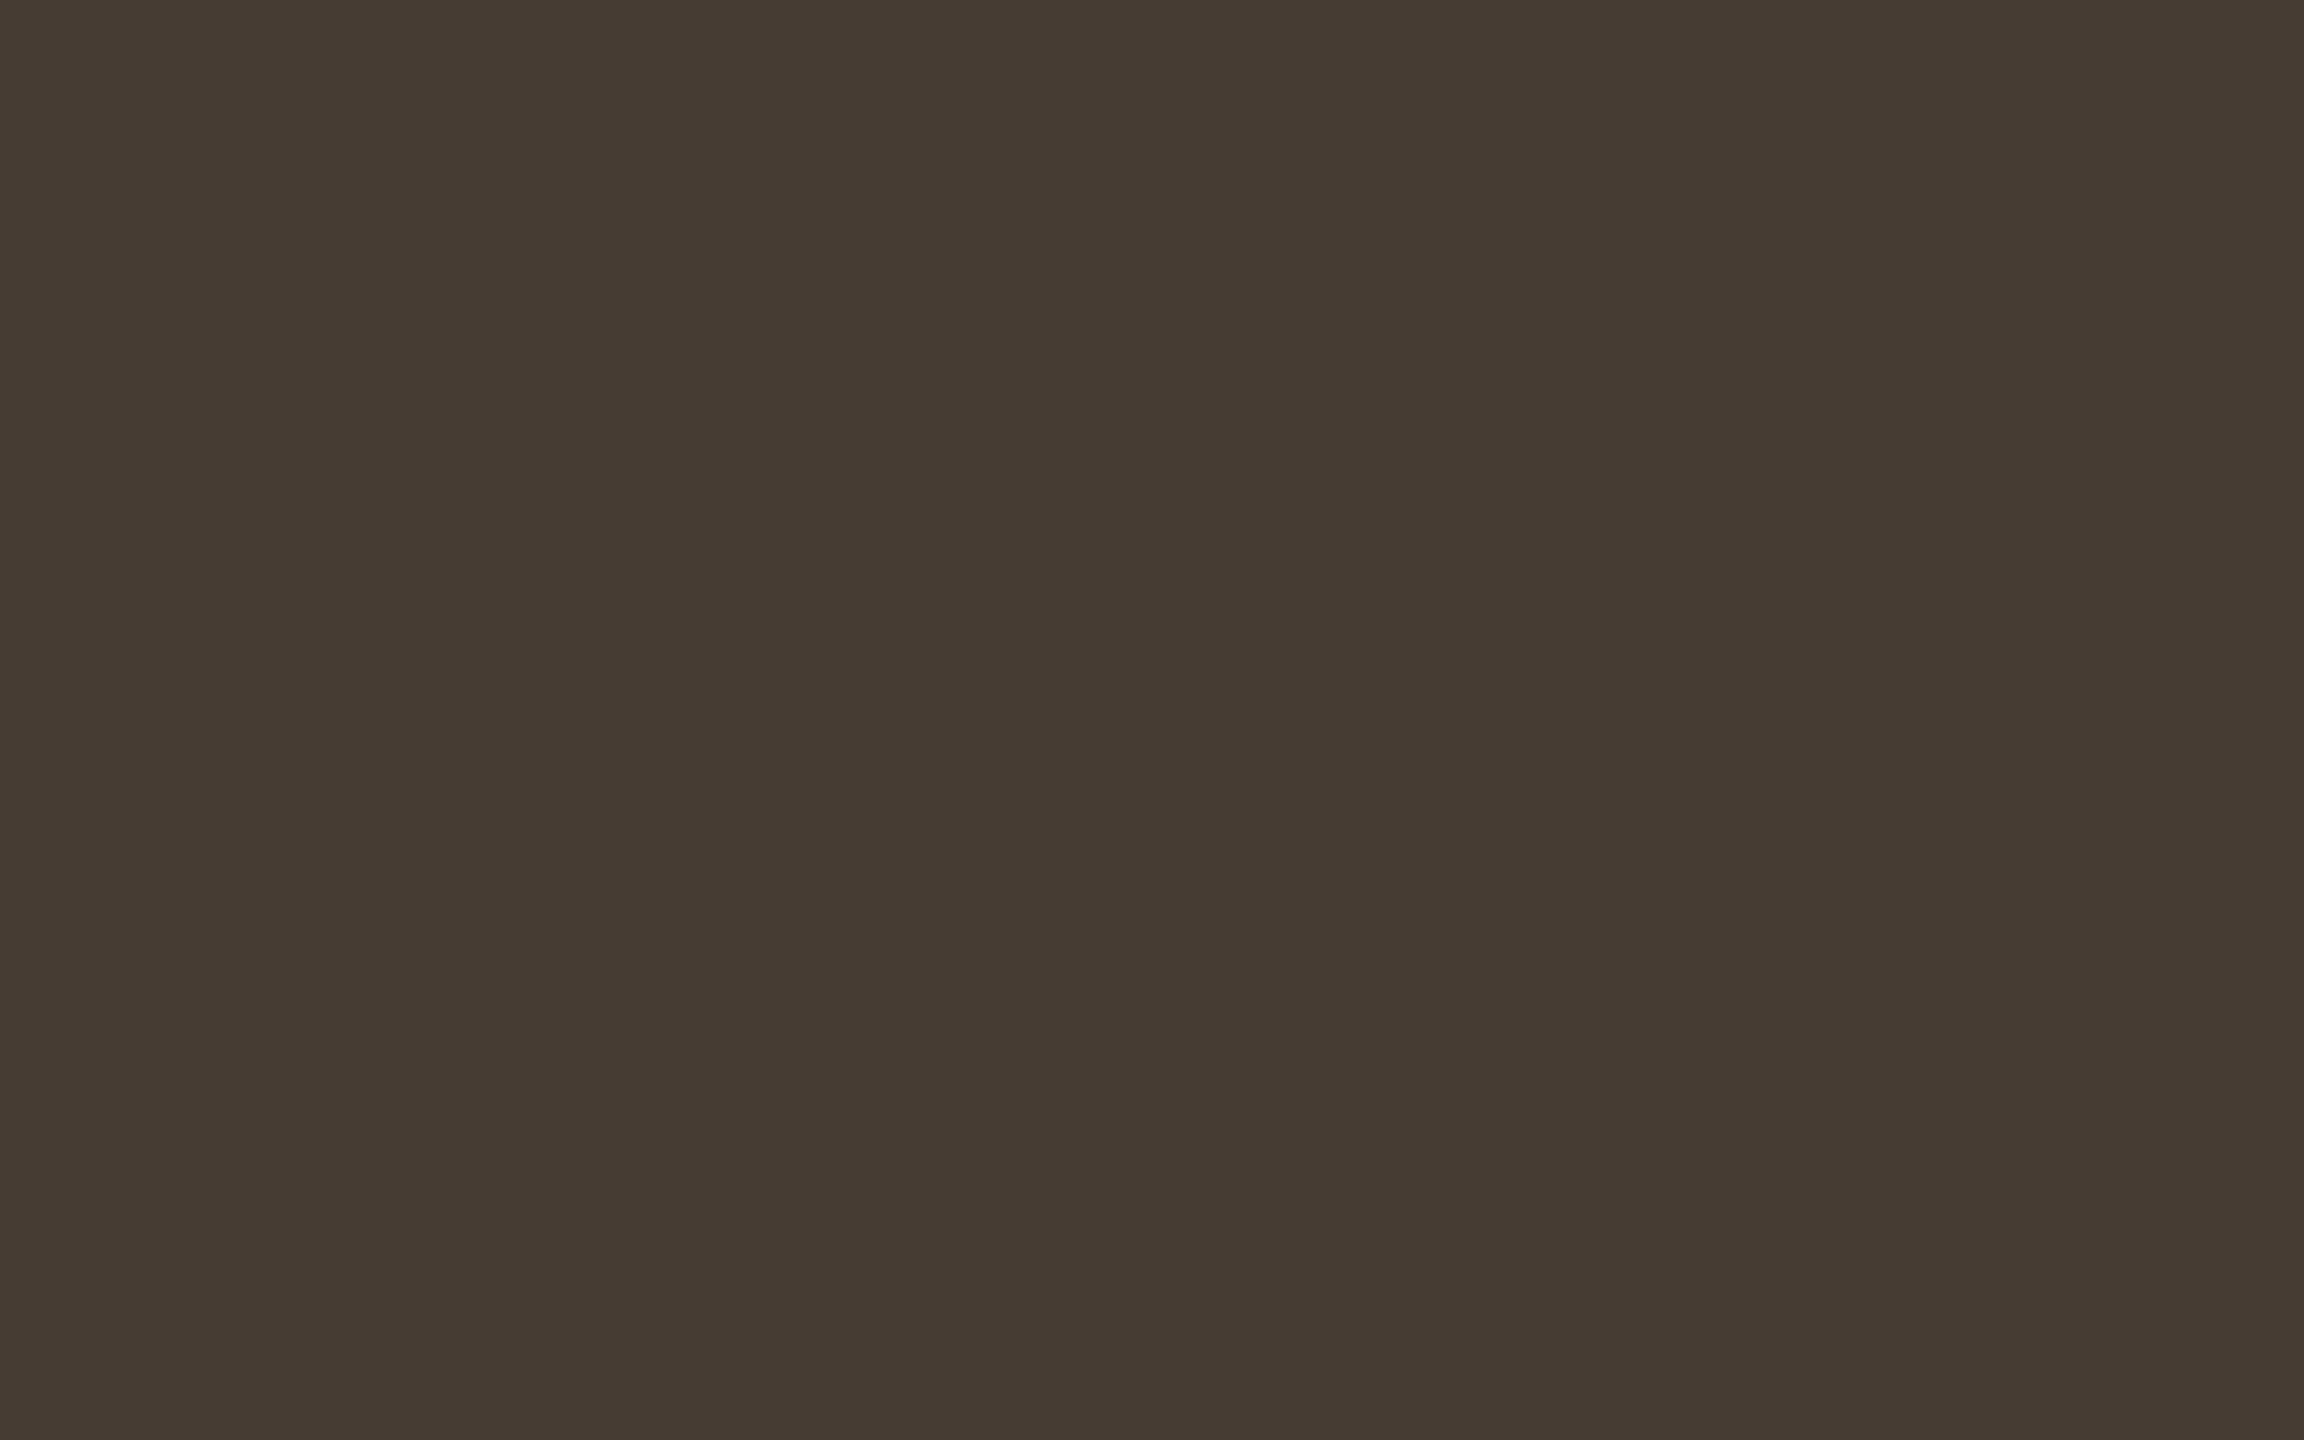 2304x1440 Dark Lava Solid Color Background